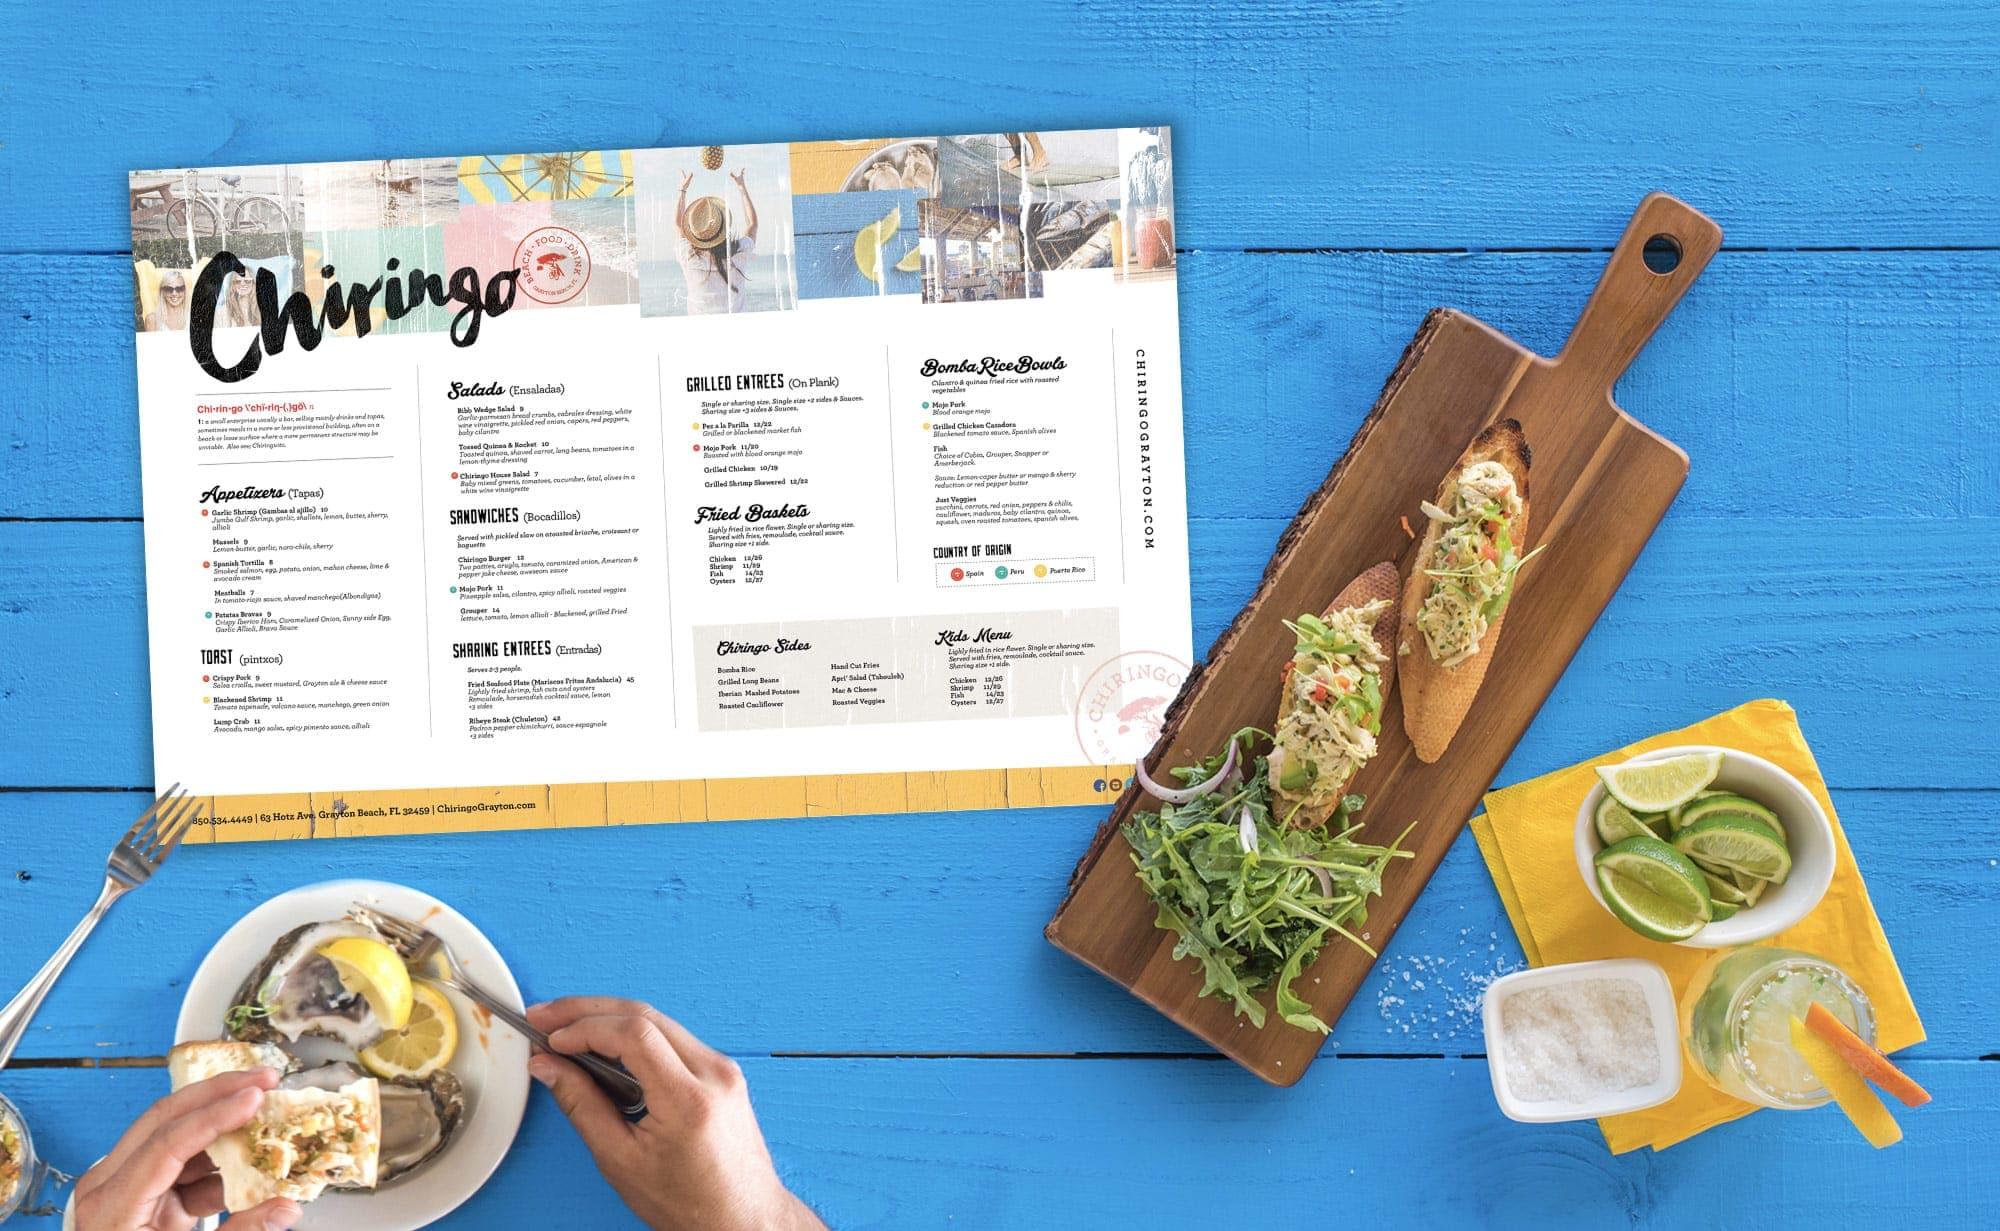 chiringo-05-menu